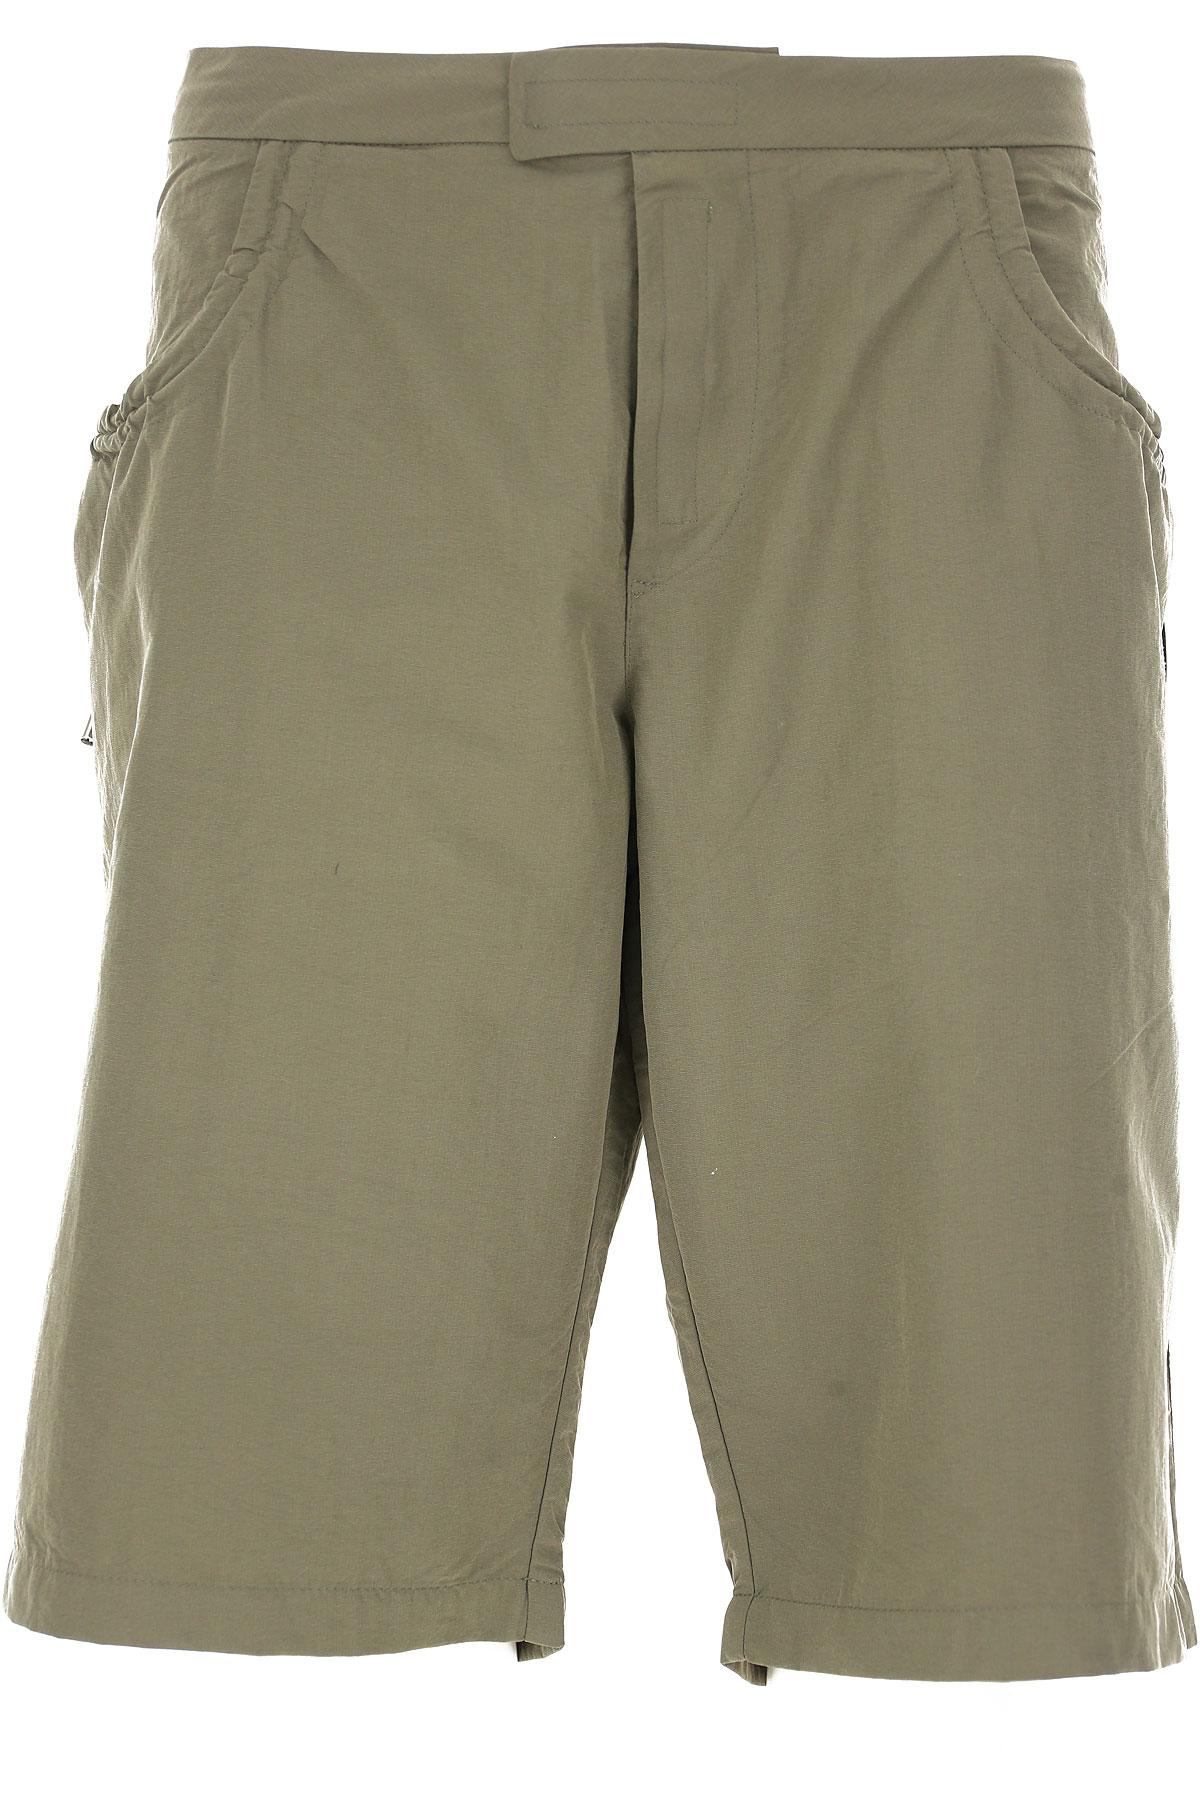 Image of Galliano Mens Swimwear On Sale in Outlet, Dark Military Green Melange, polyester, 2017, M (EU 48) L (EU 50) XL (EU 52)